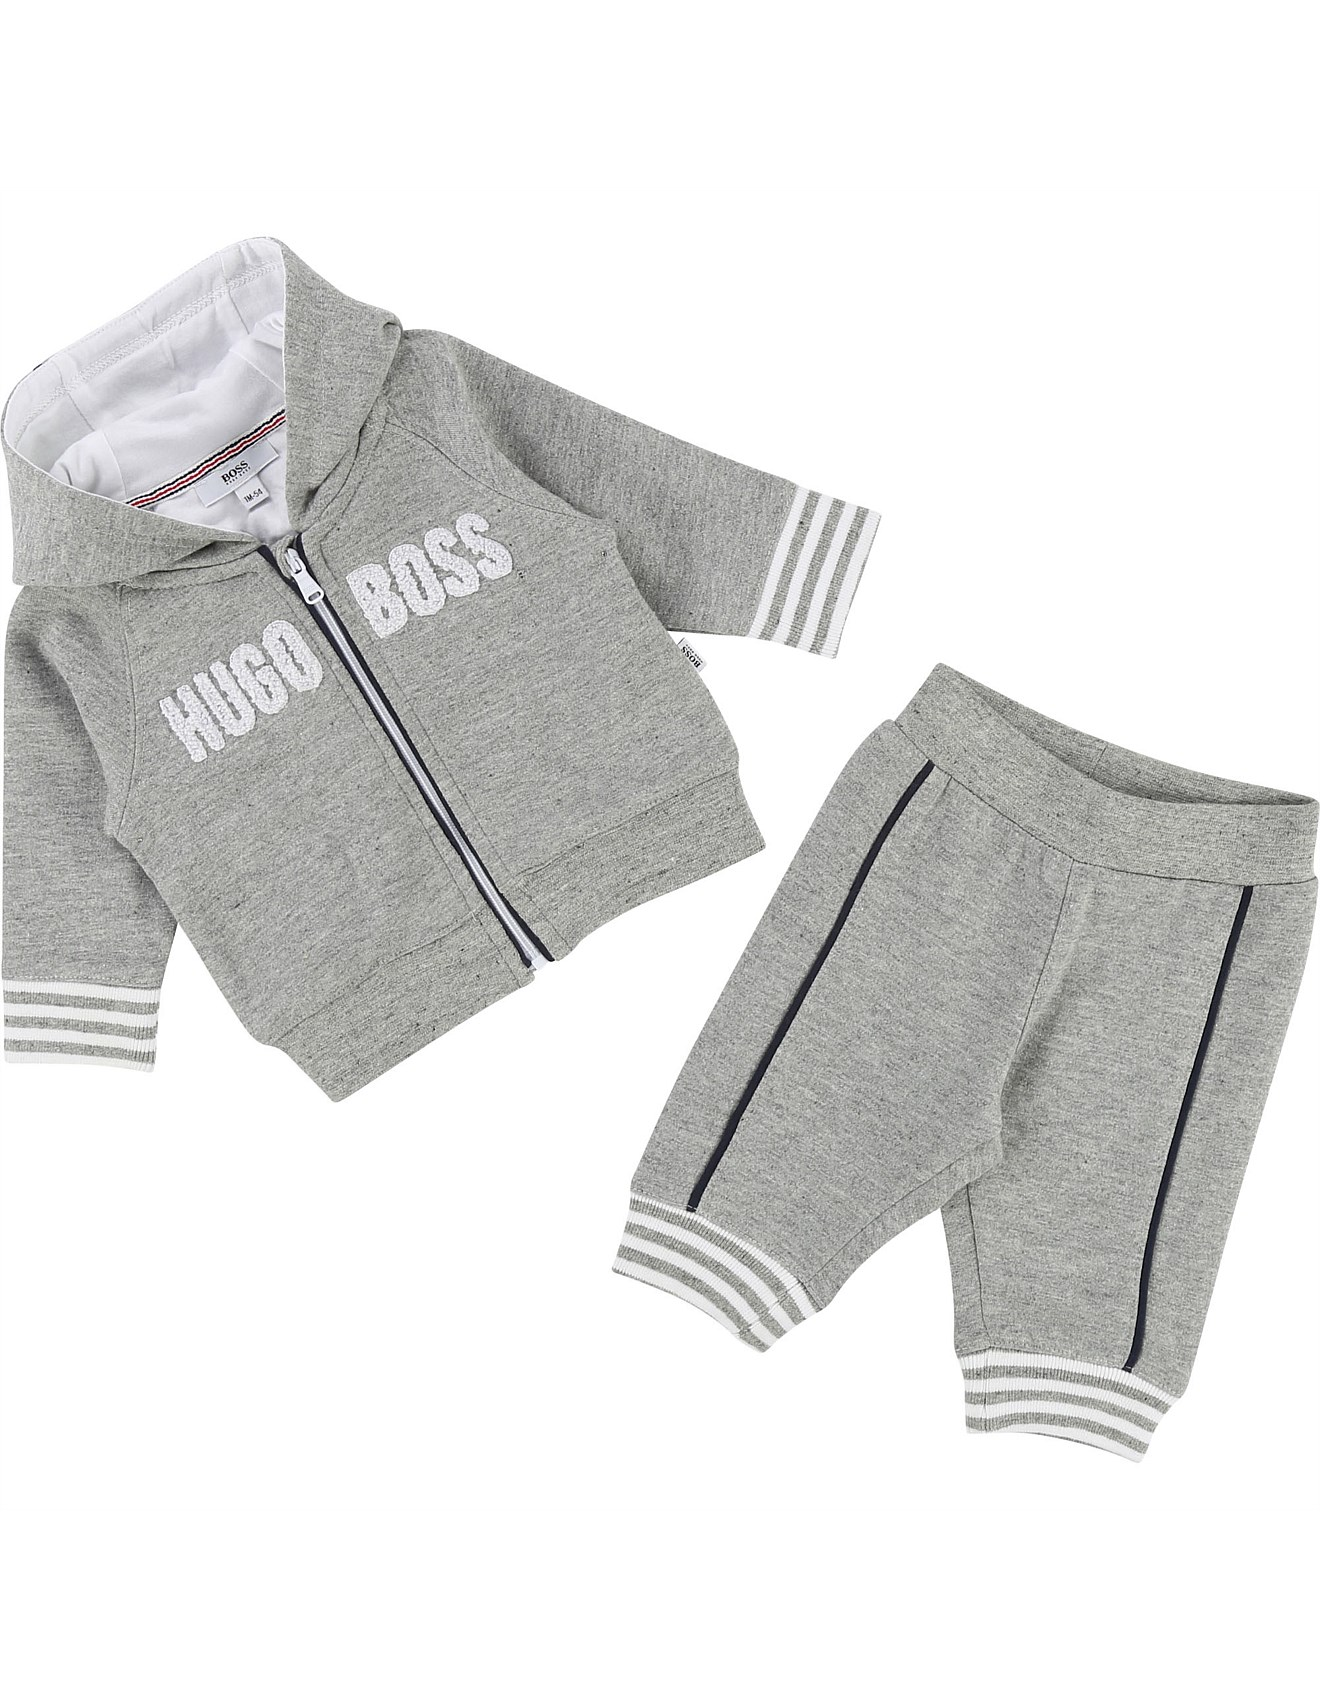 e98de018e Baby Clothing | Buy Baby Clothes & Accessories | David Jones - Track ...